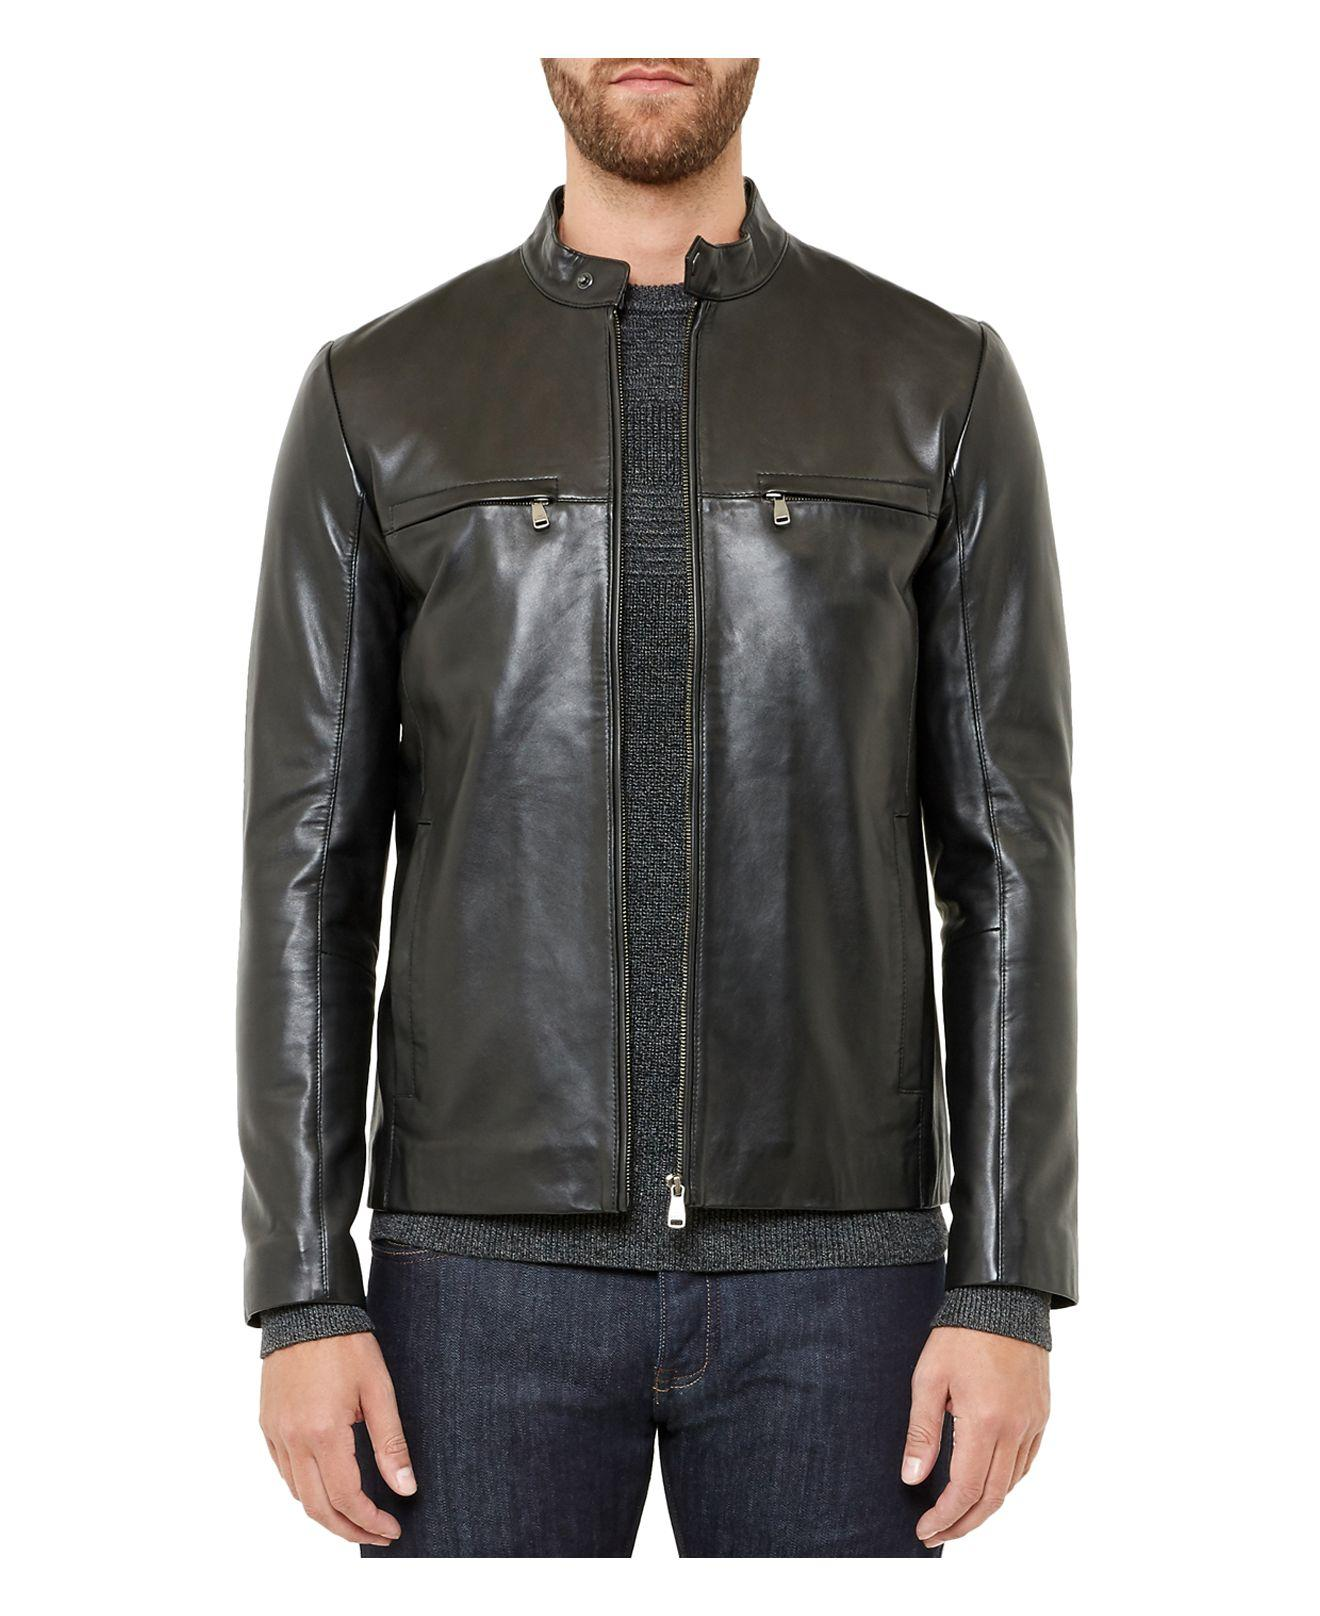 8f3f8d3748cb88 Lyst - Ted Baker Pablo Leather Jacket in Black for Men